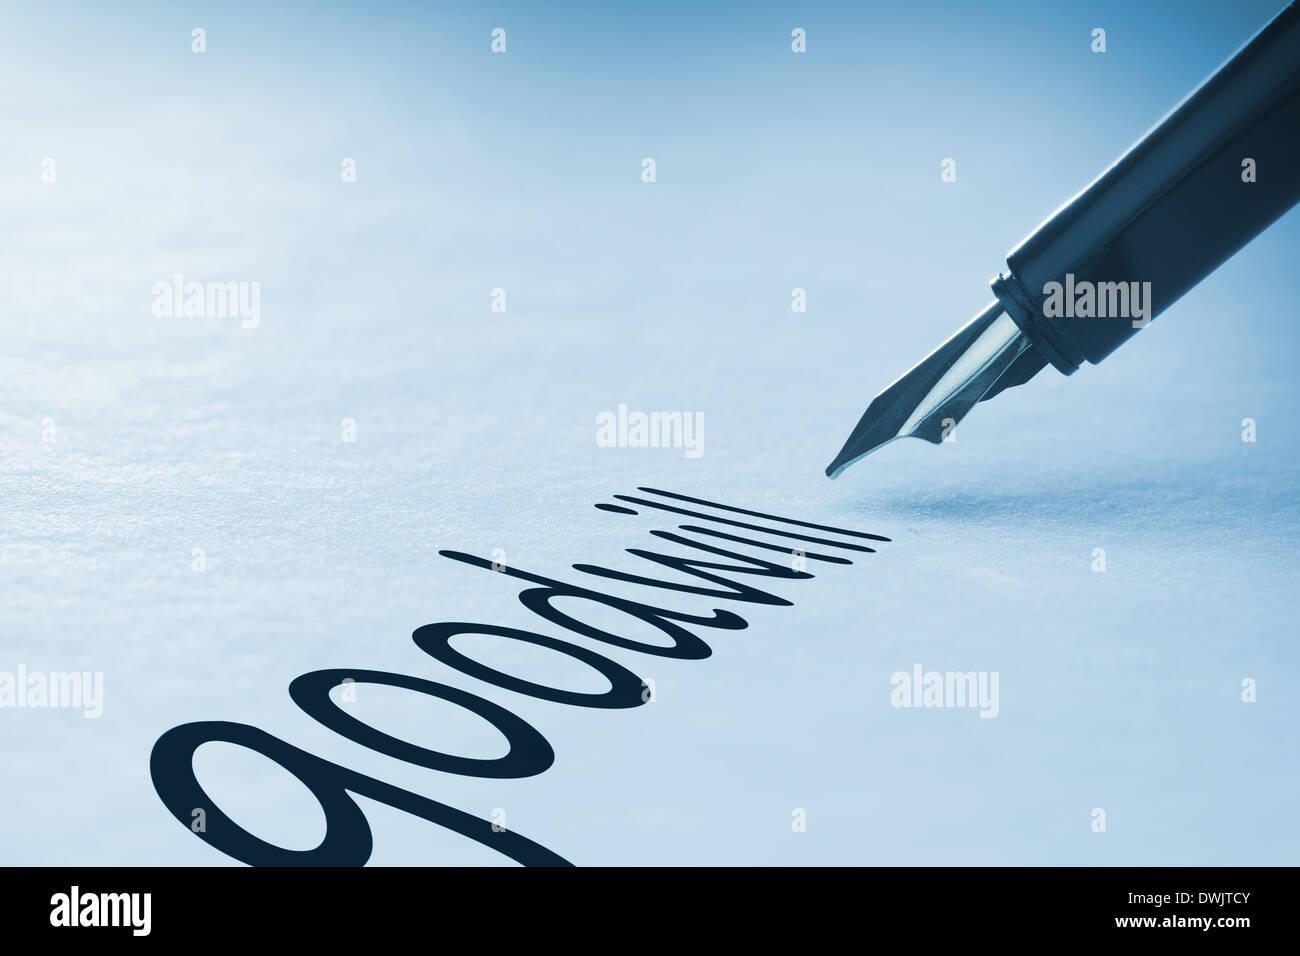 Fountain pen writing Goodwill - Stock Image